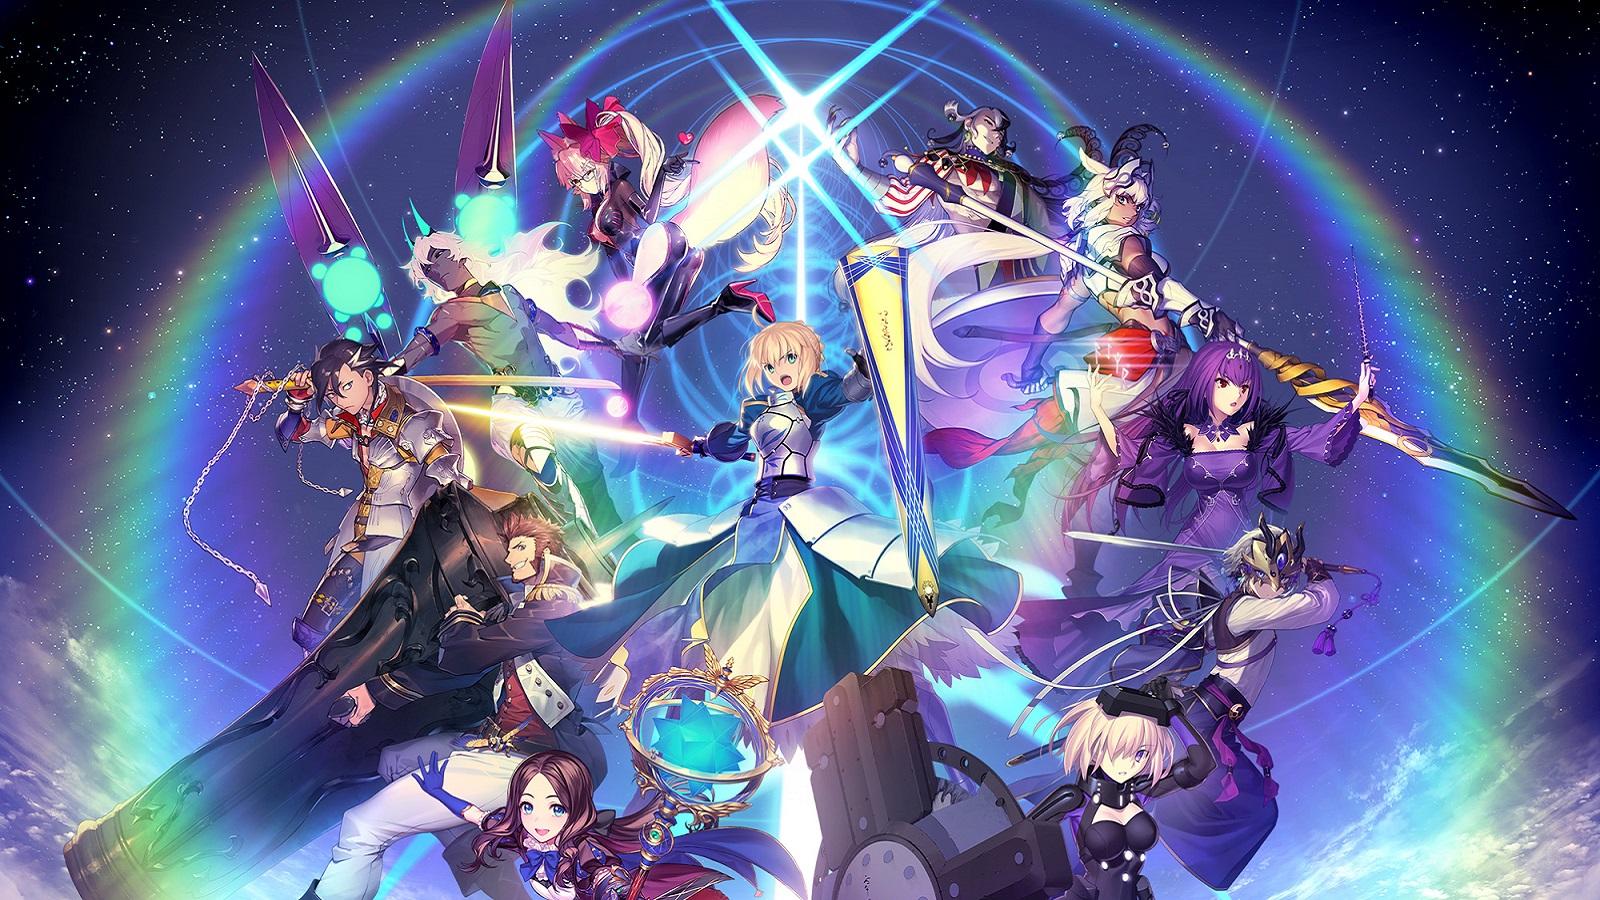 Servants, rejoice! Fate/Grand Order holds five million